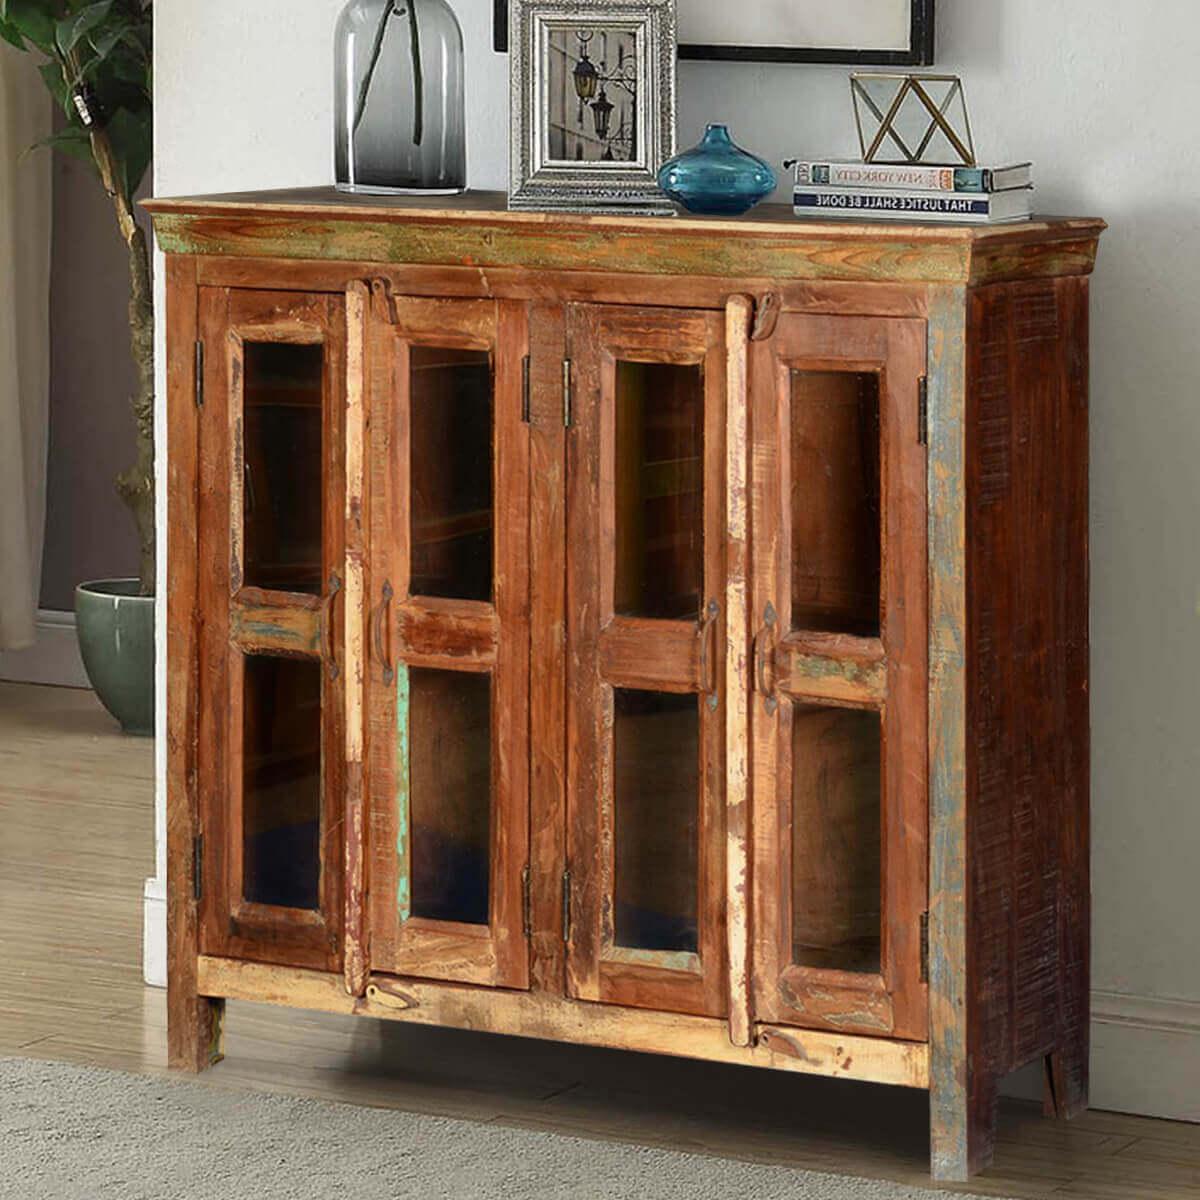 Appalachian Rustic Reclaimed Wood Glass Door Display